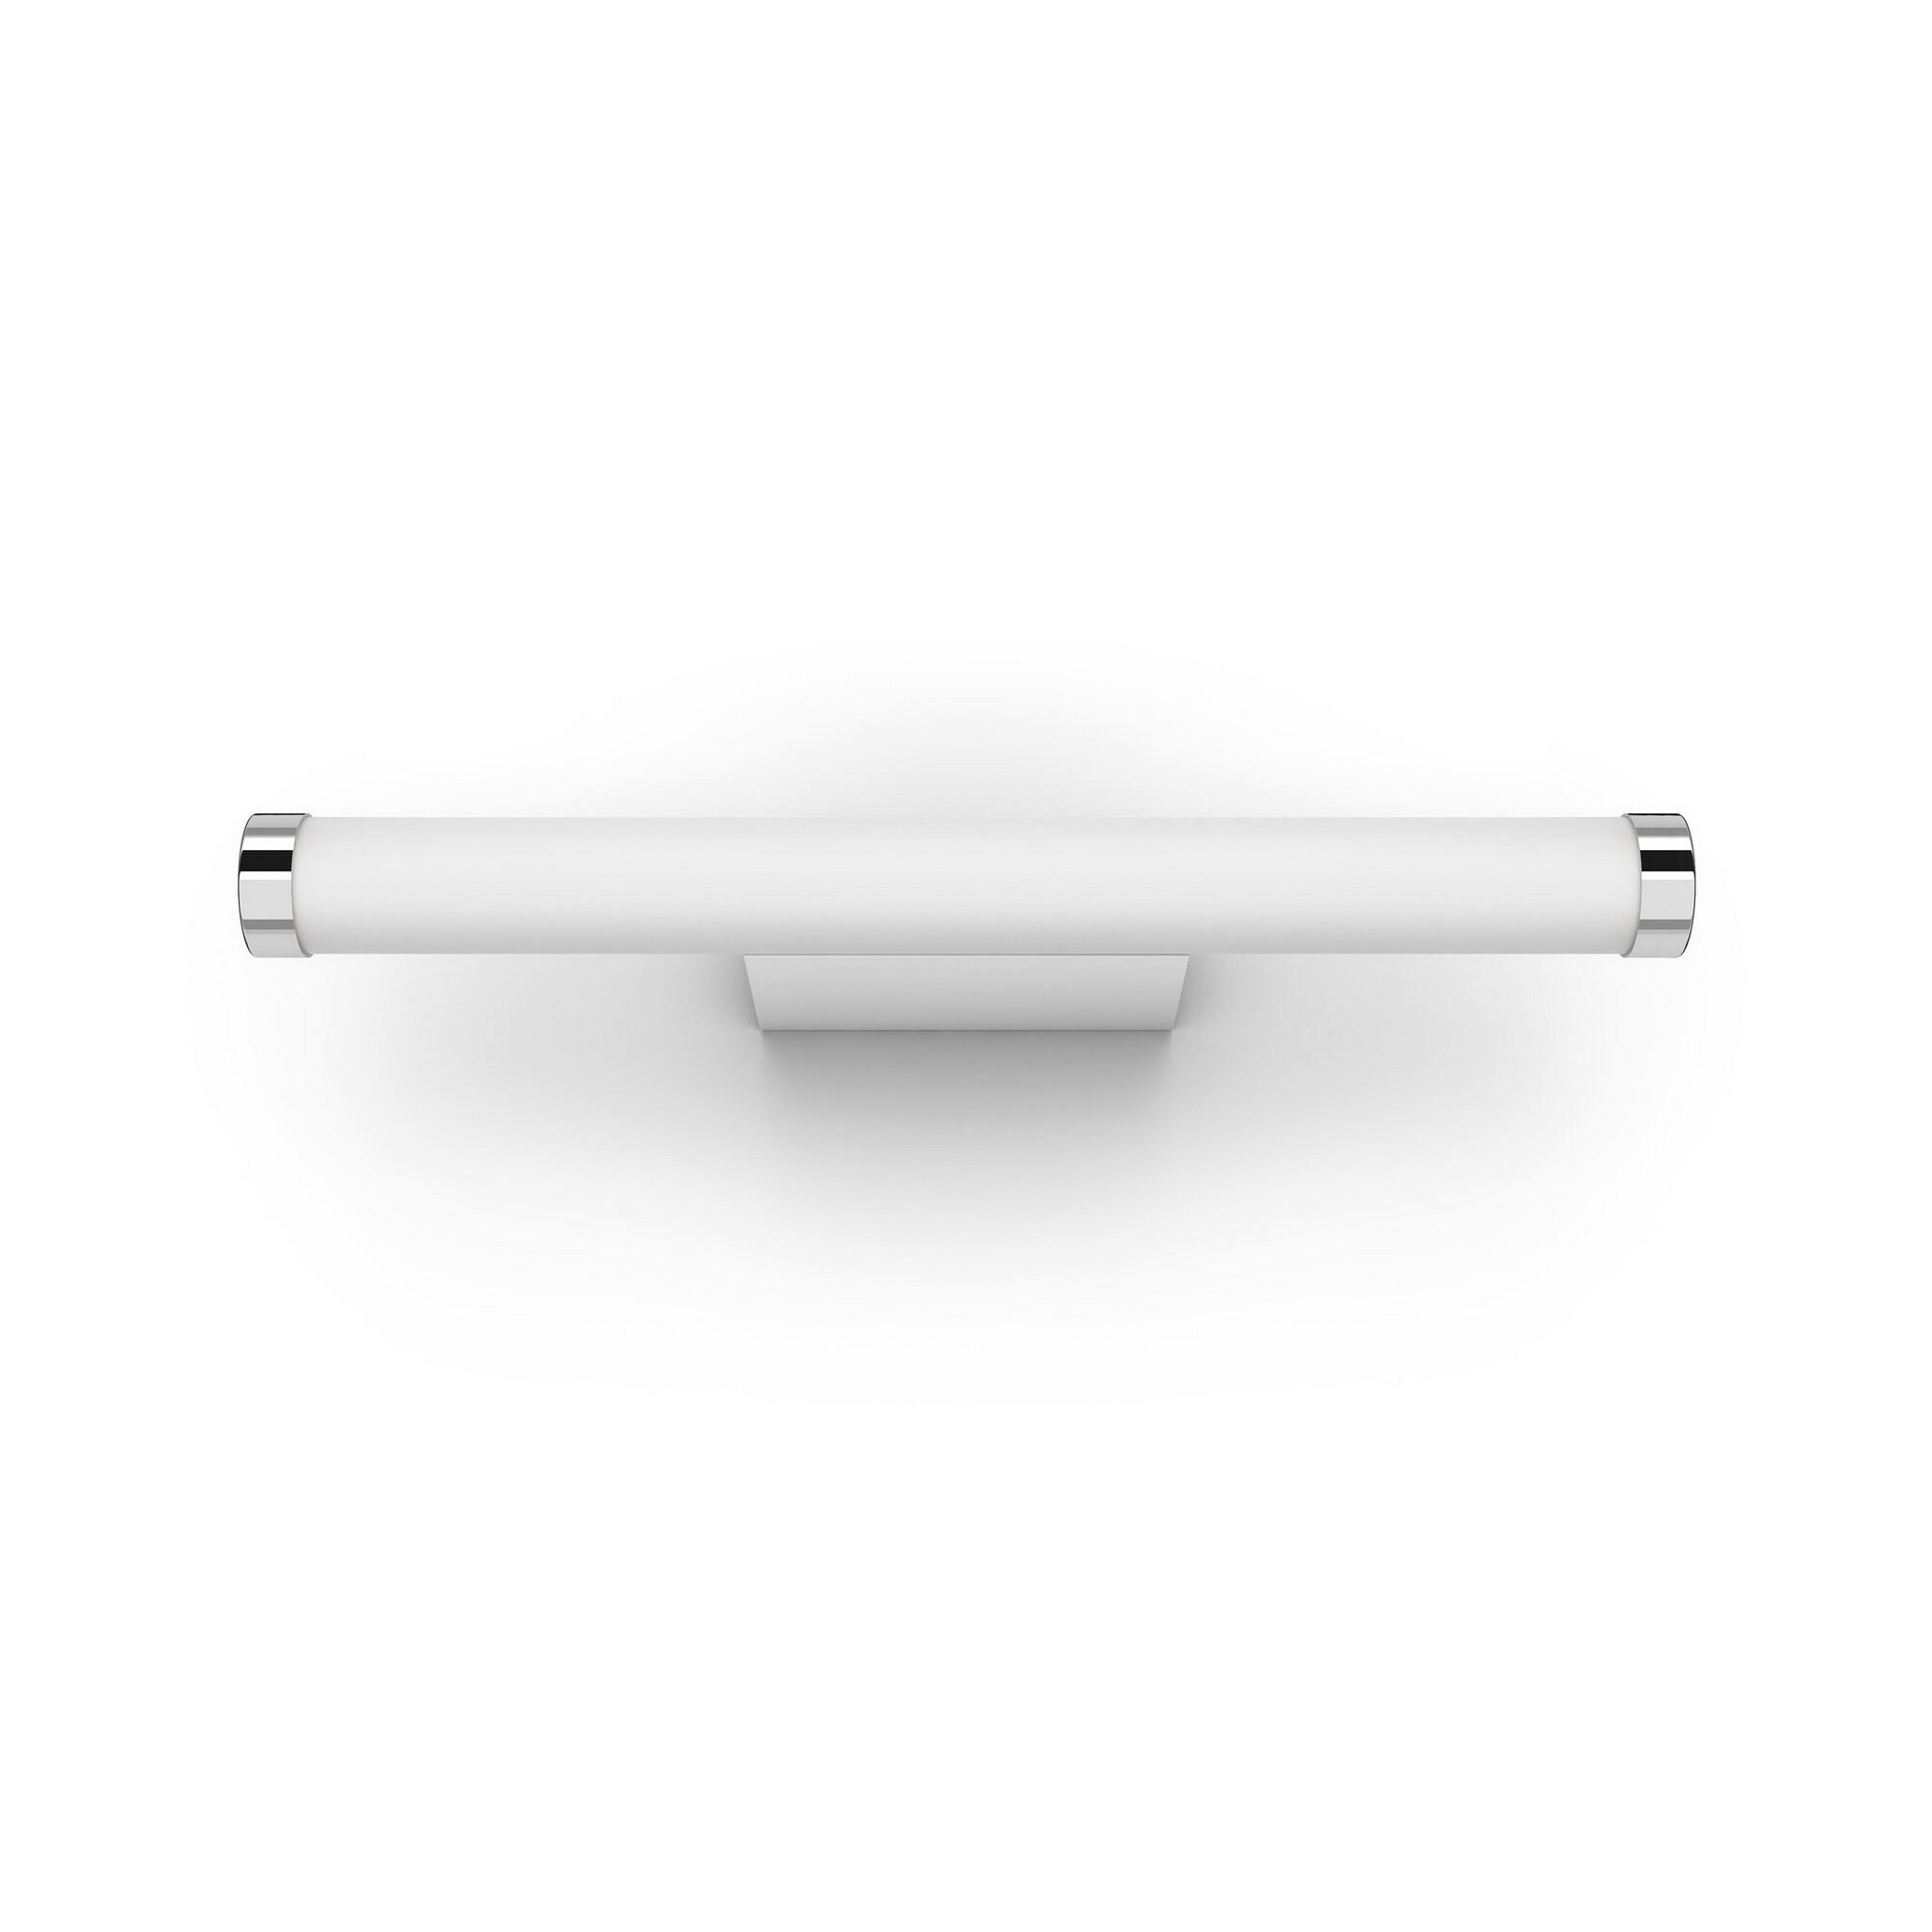 Philips HUE ADORE Applique LED 1x13W/1050lm Blanc